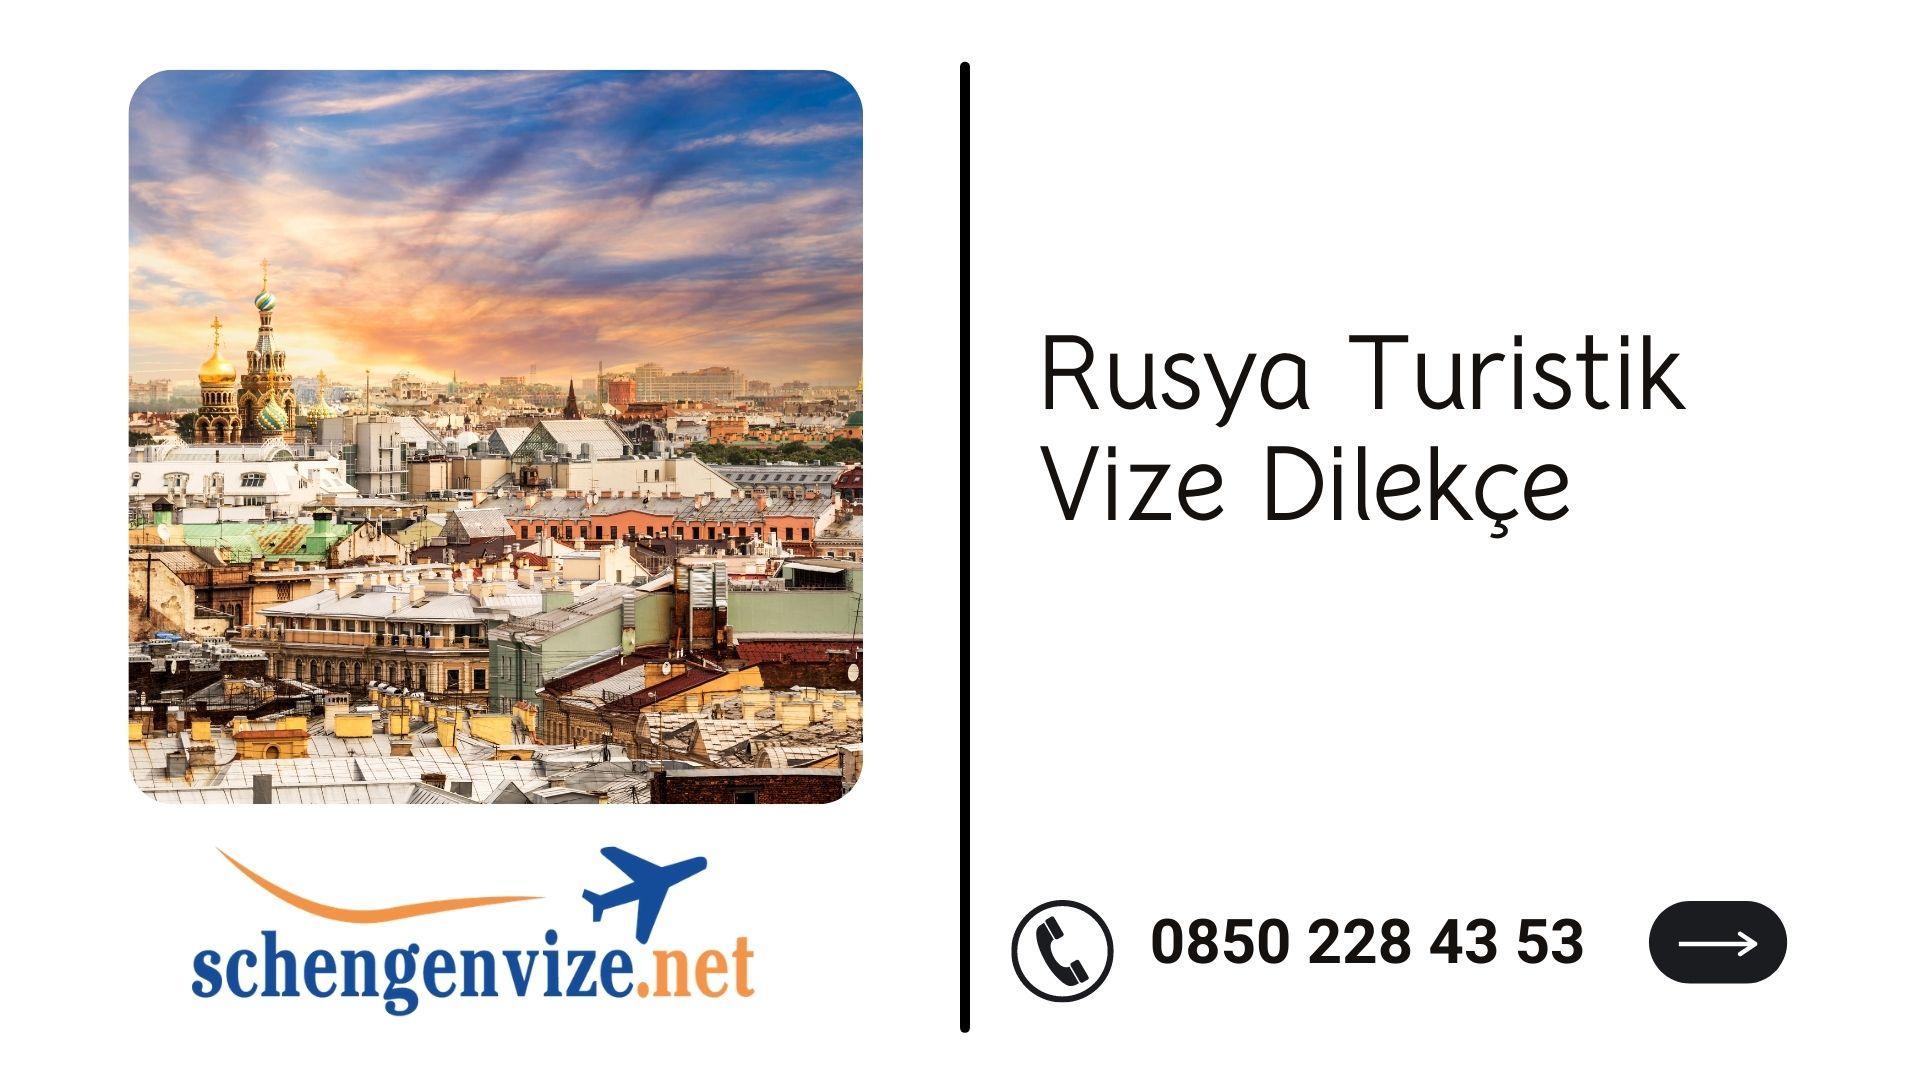 Rusya Turistik Vize Dilekçe